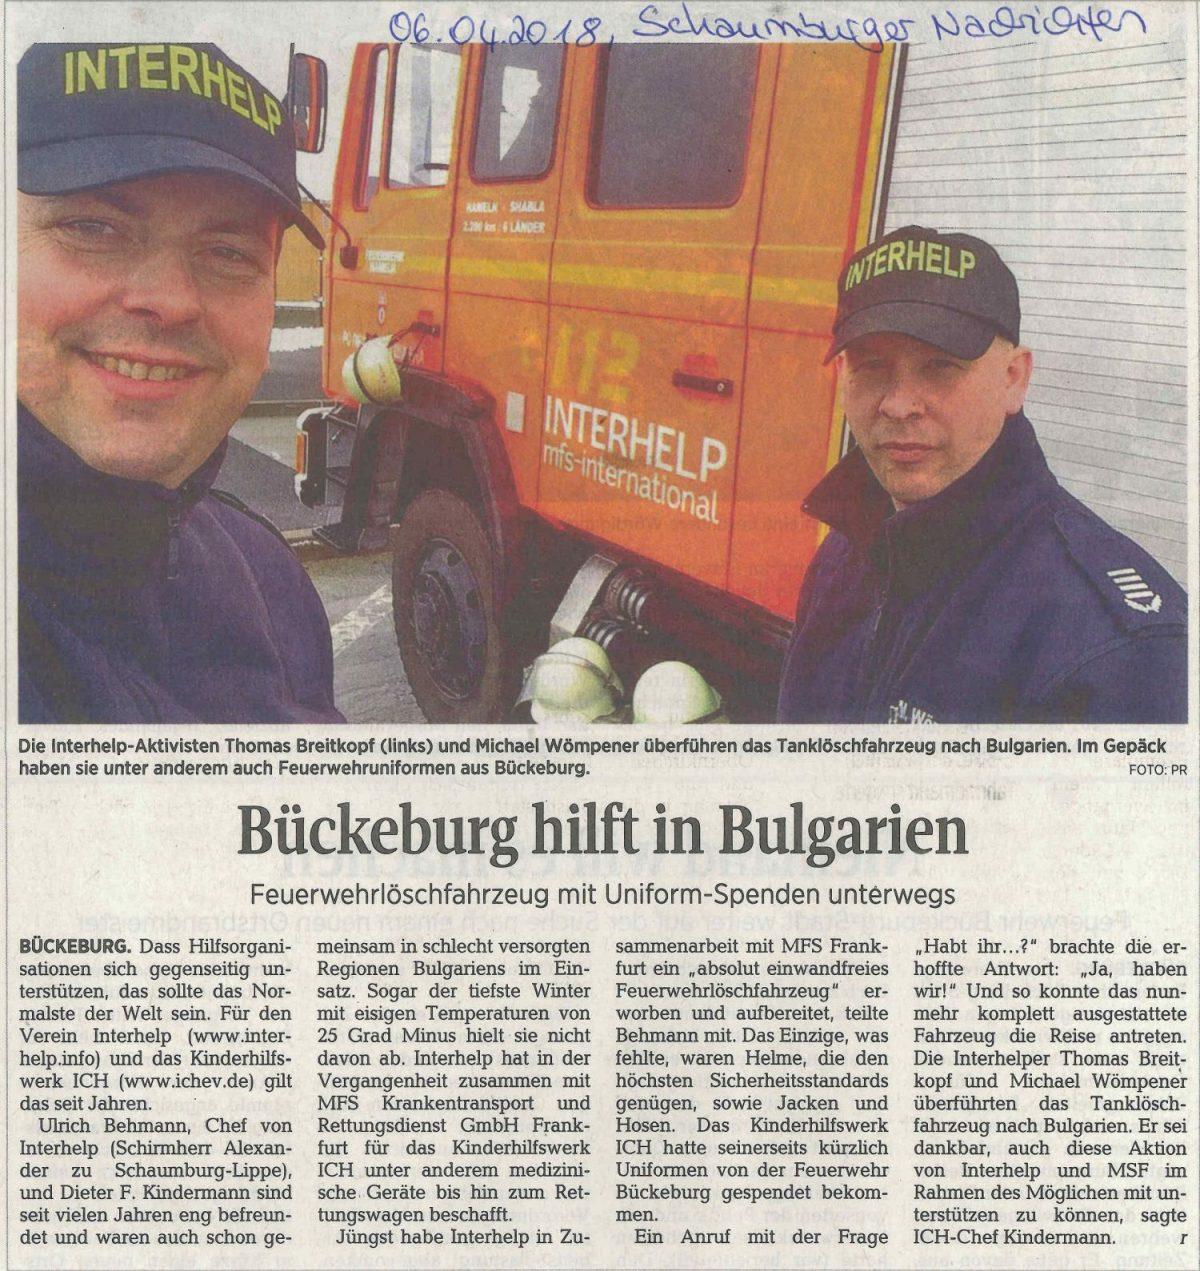 Bückeburg hilft in Bulgarien